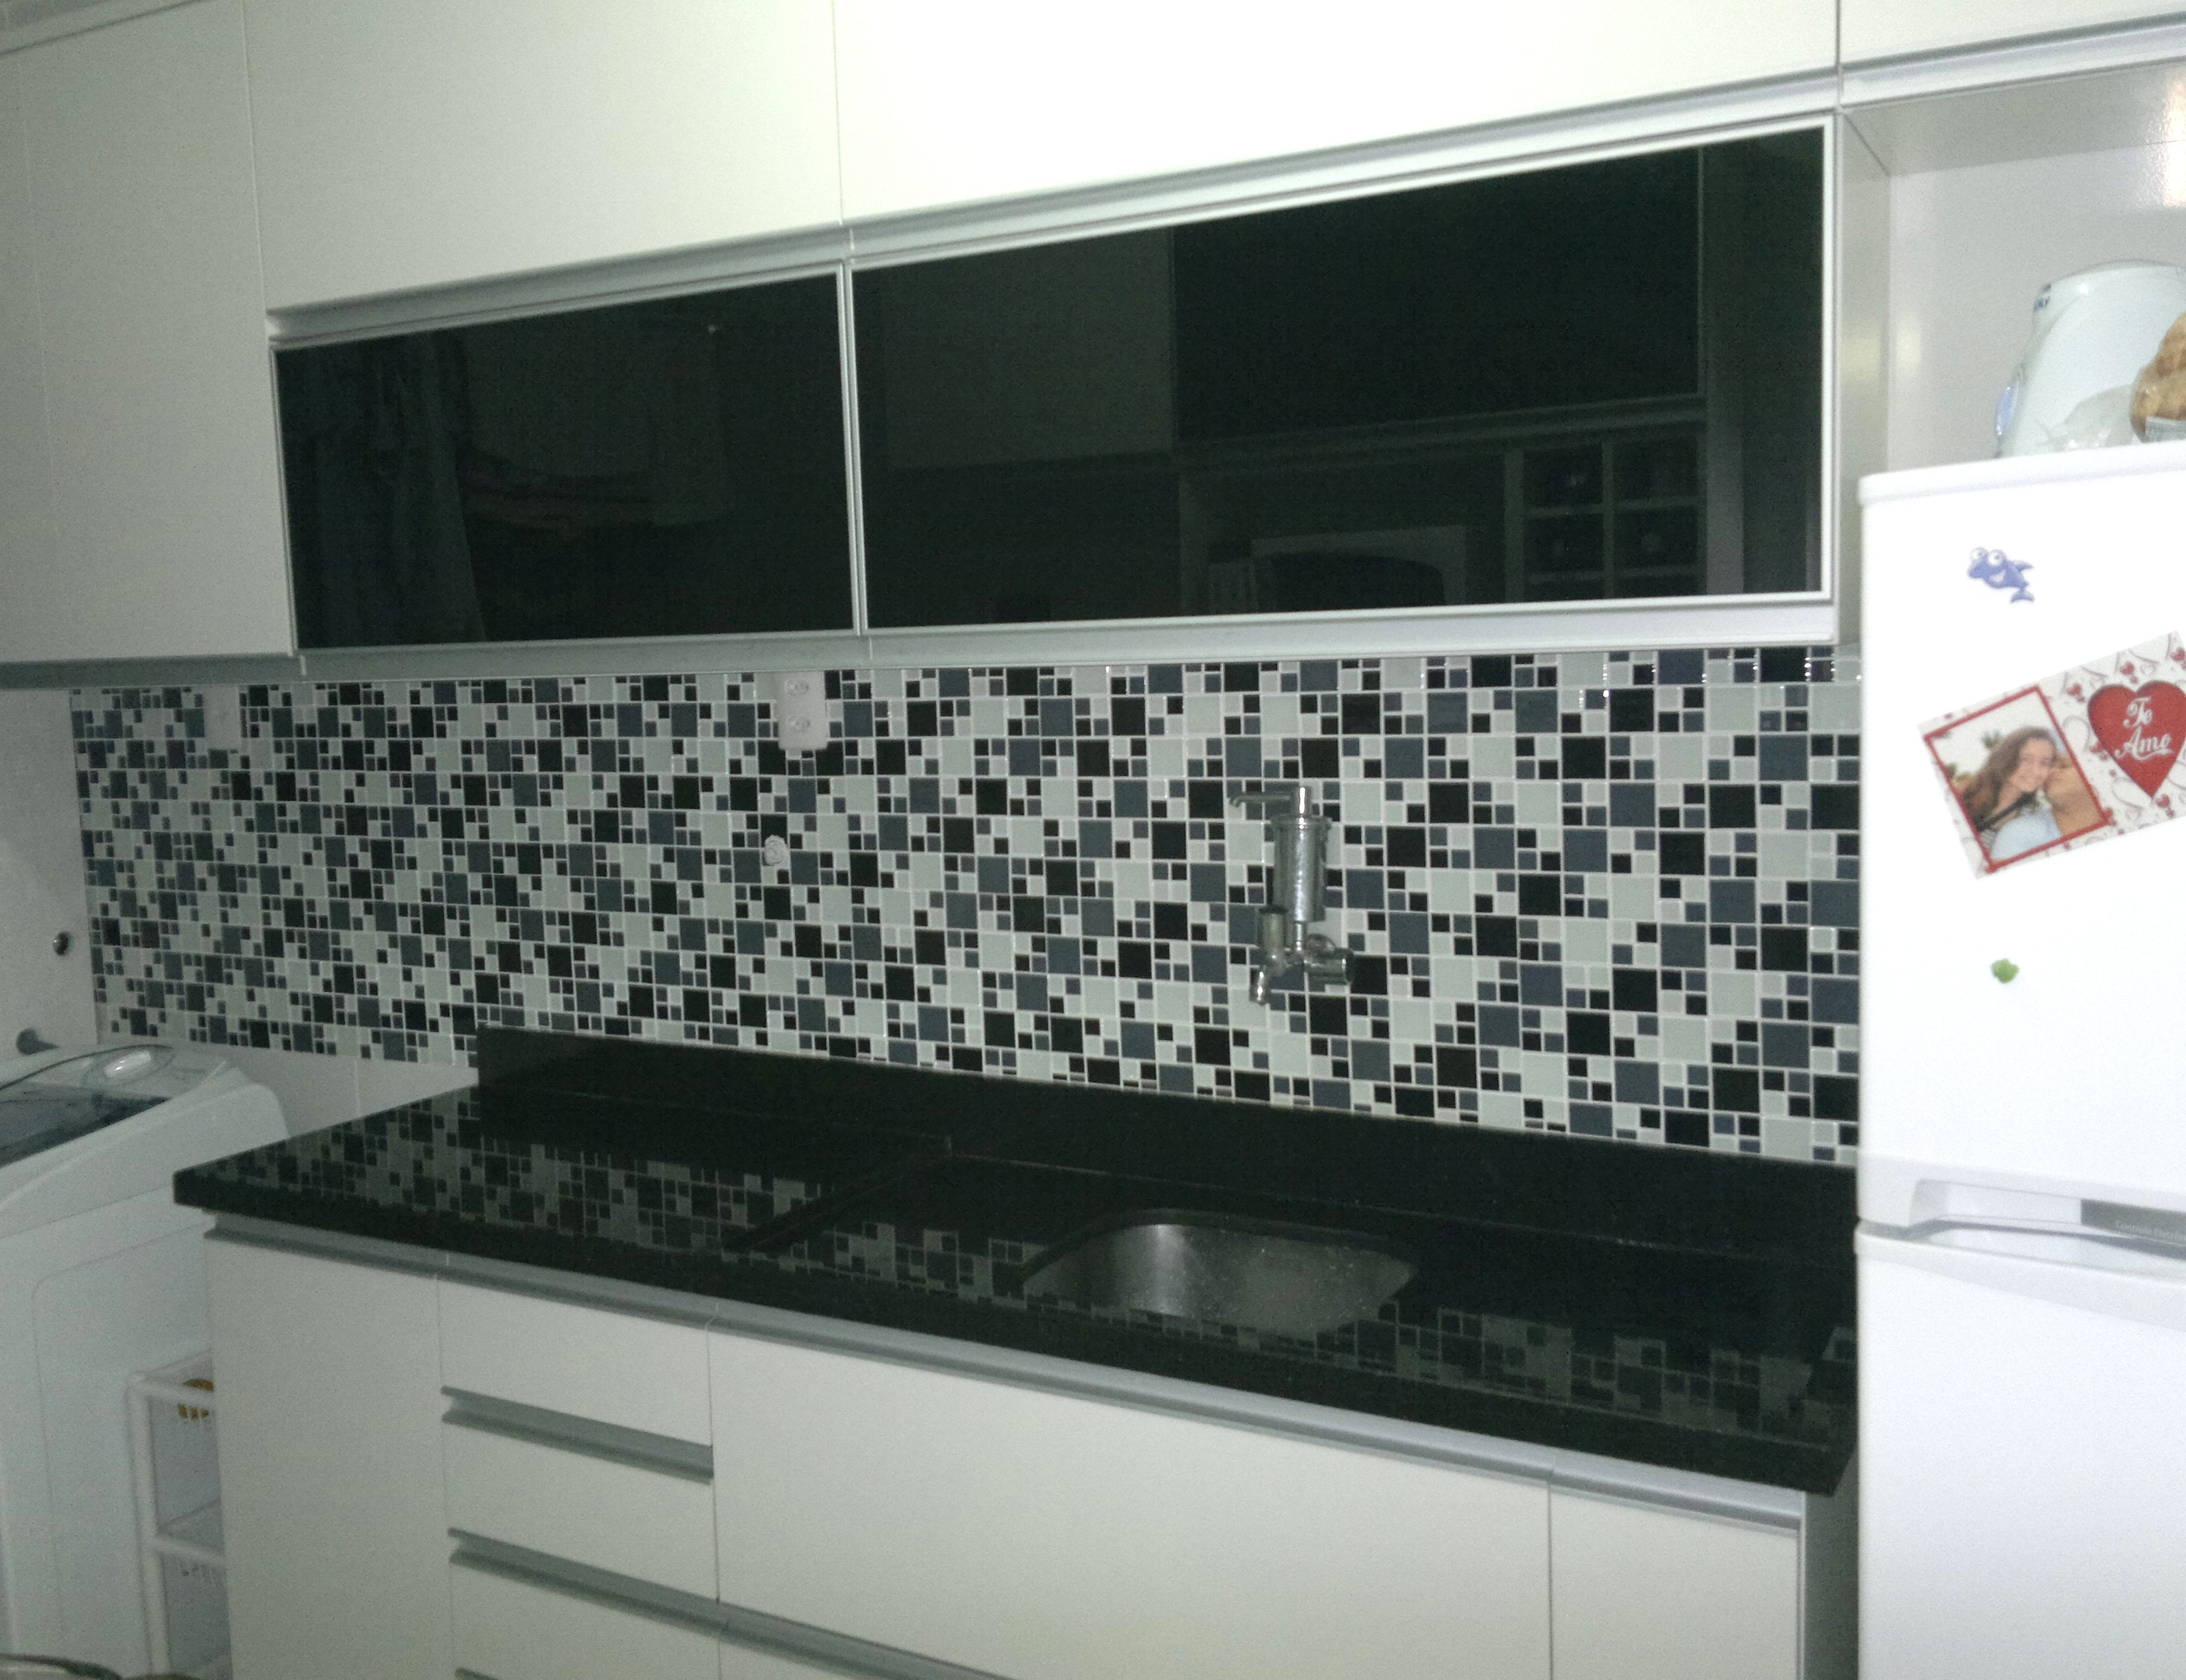 Cozinha com Pastilhas de Vidro - Nadija BA